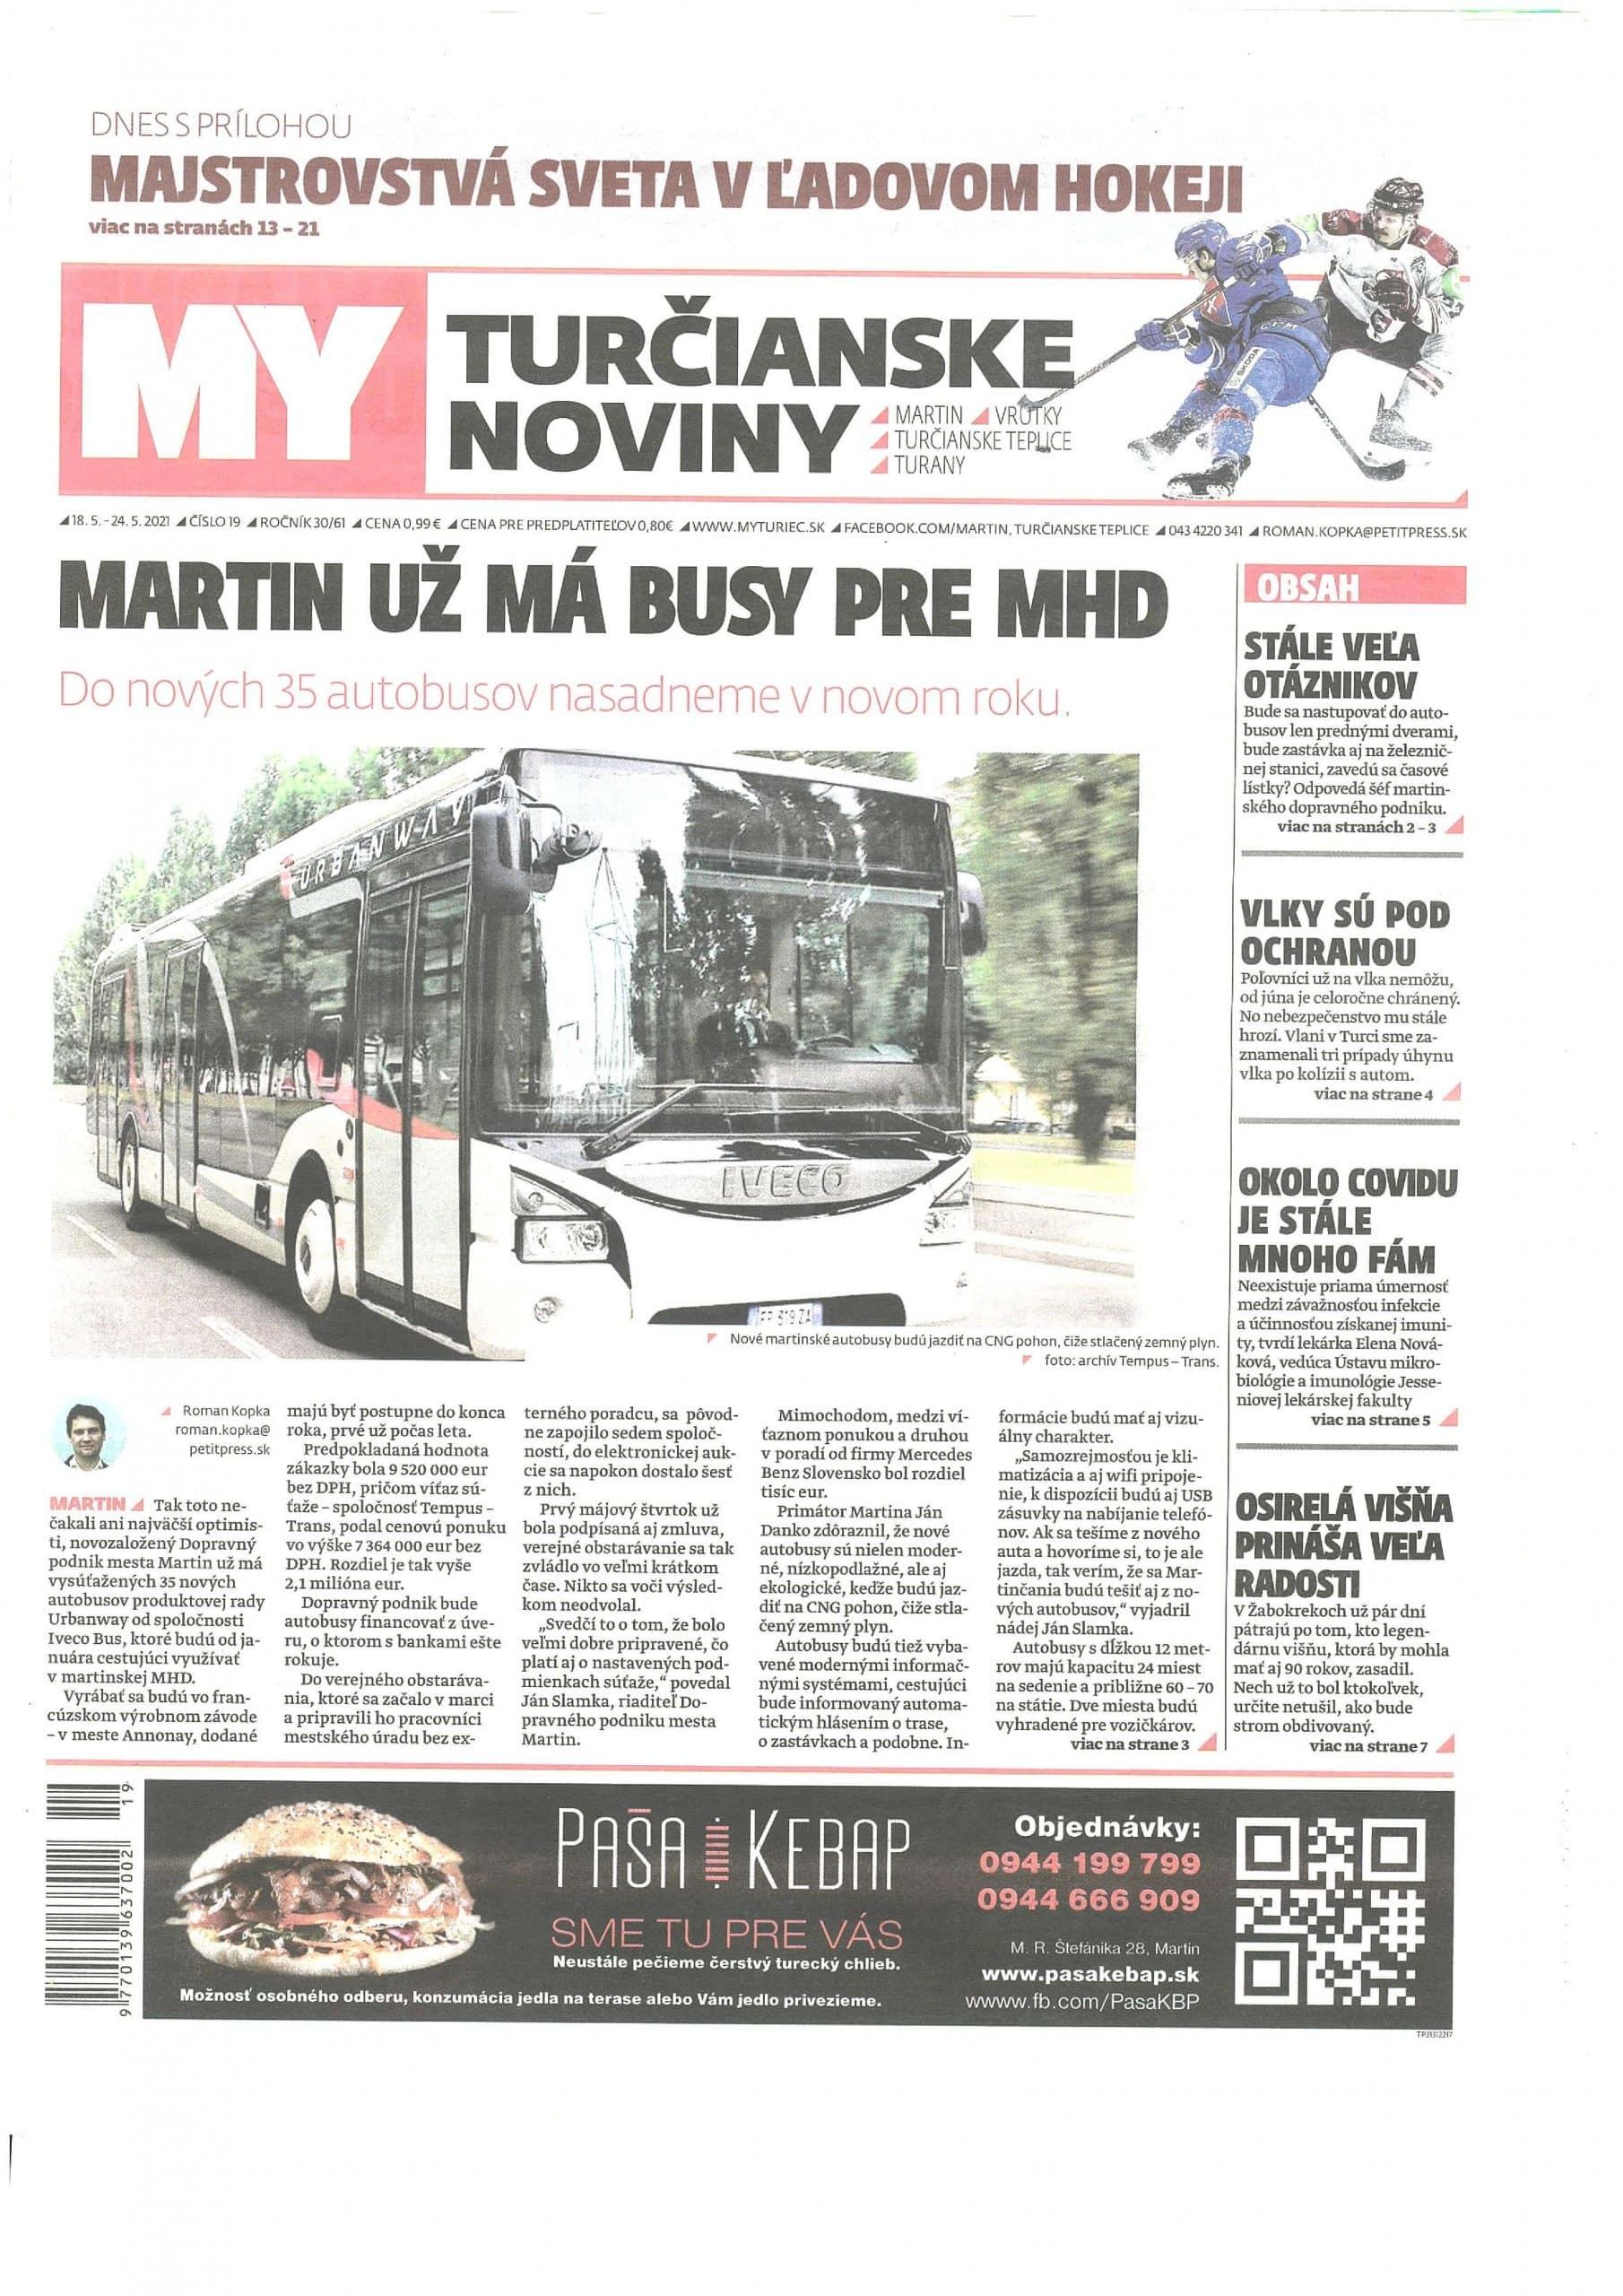 GARDEON v Turčianských Novinách